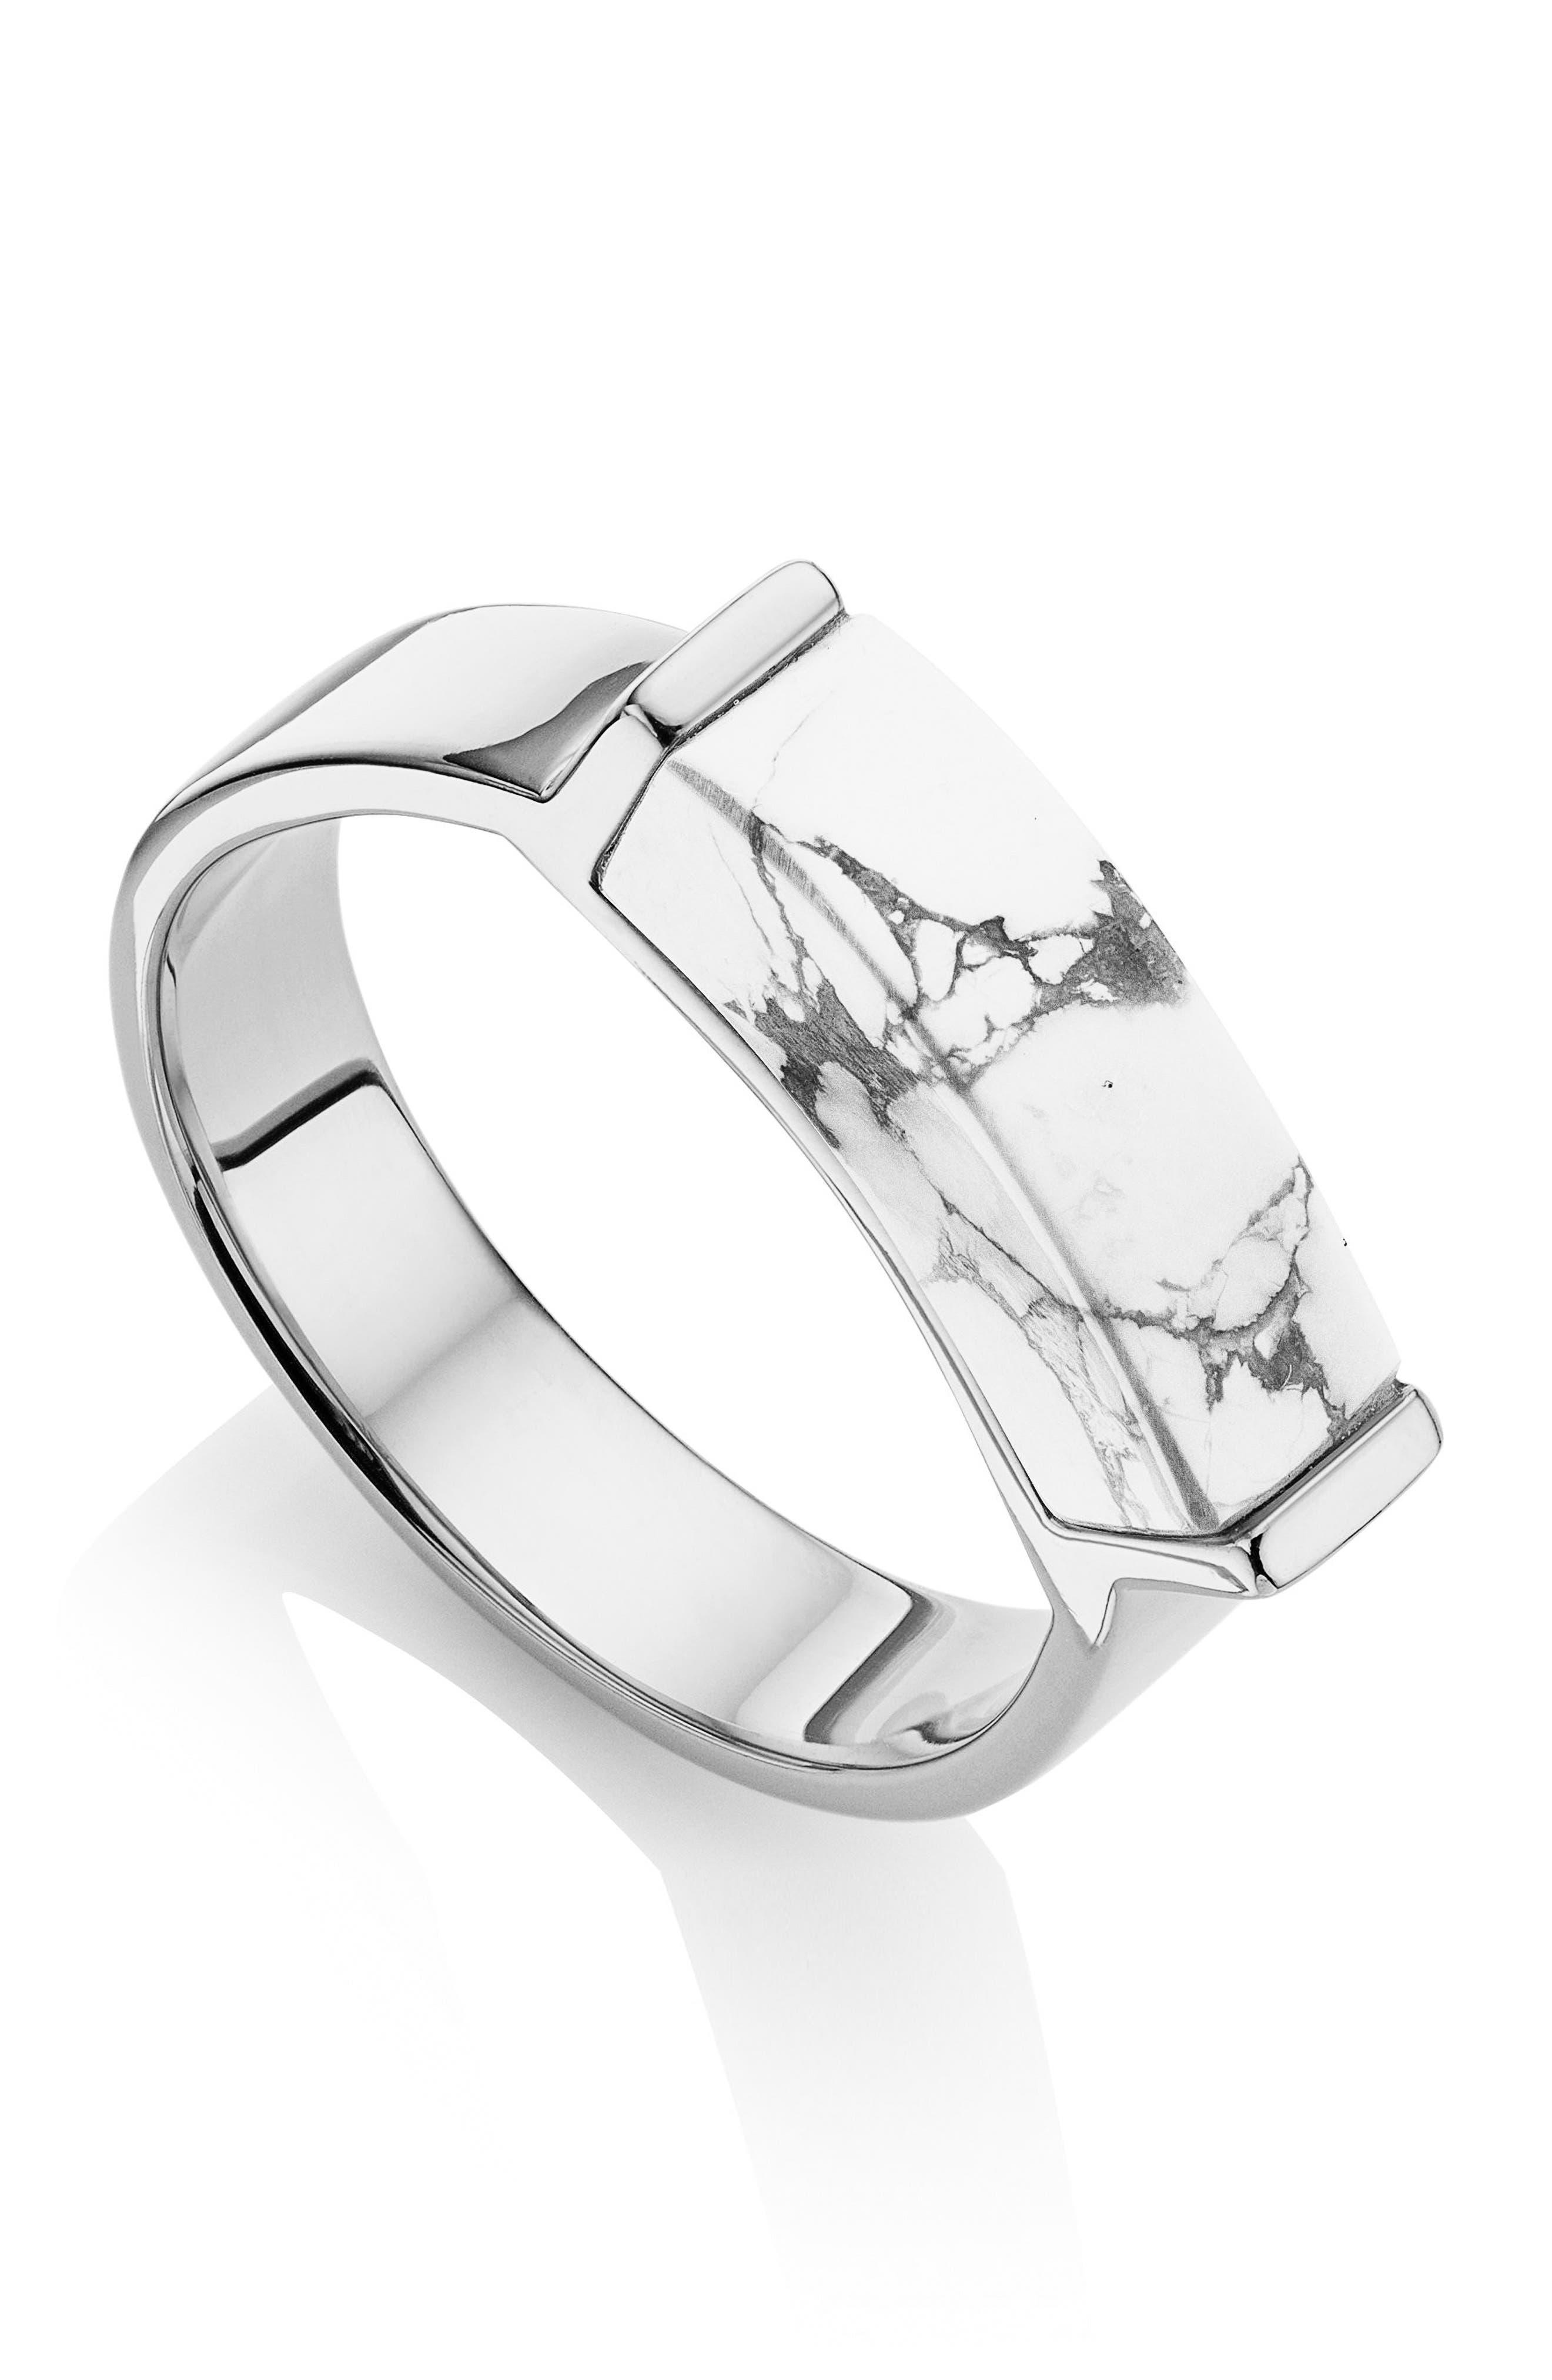 Baja Deco Ring,                         Main,                         color, Silver/ Howlite